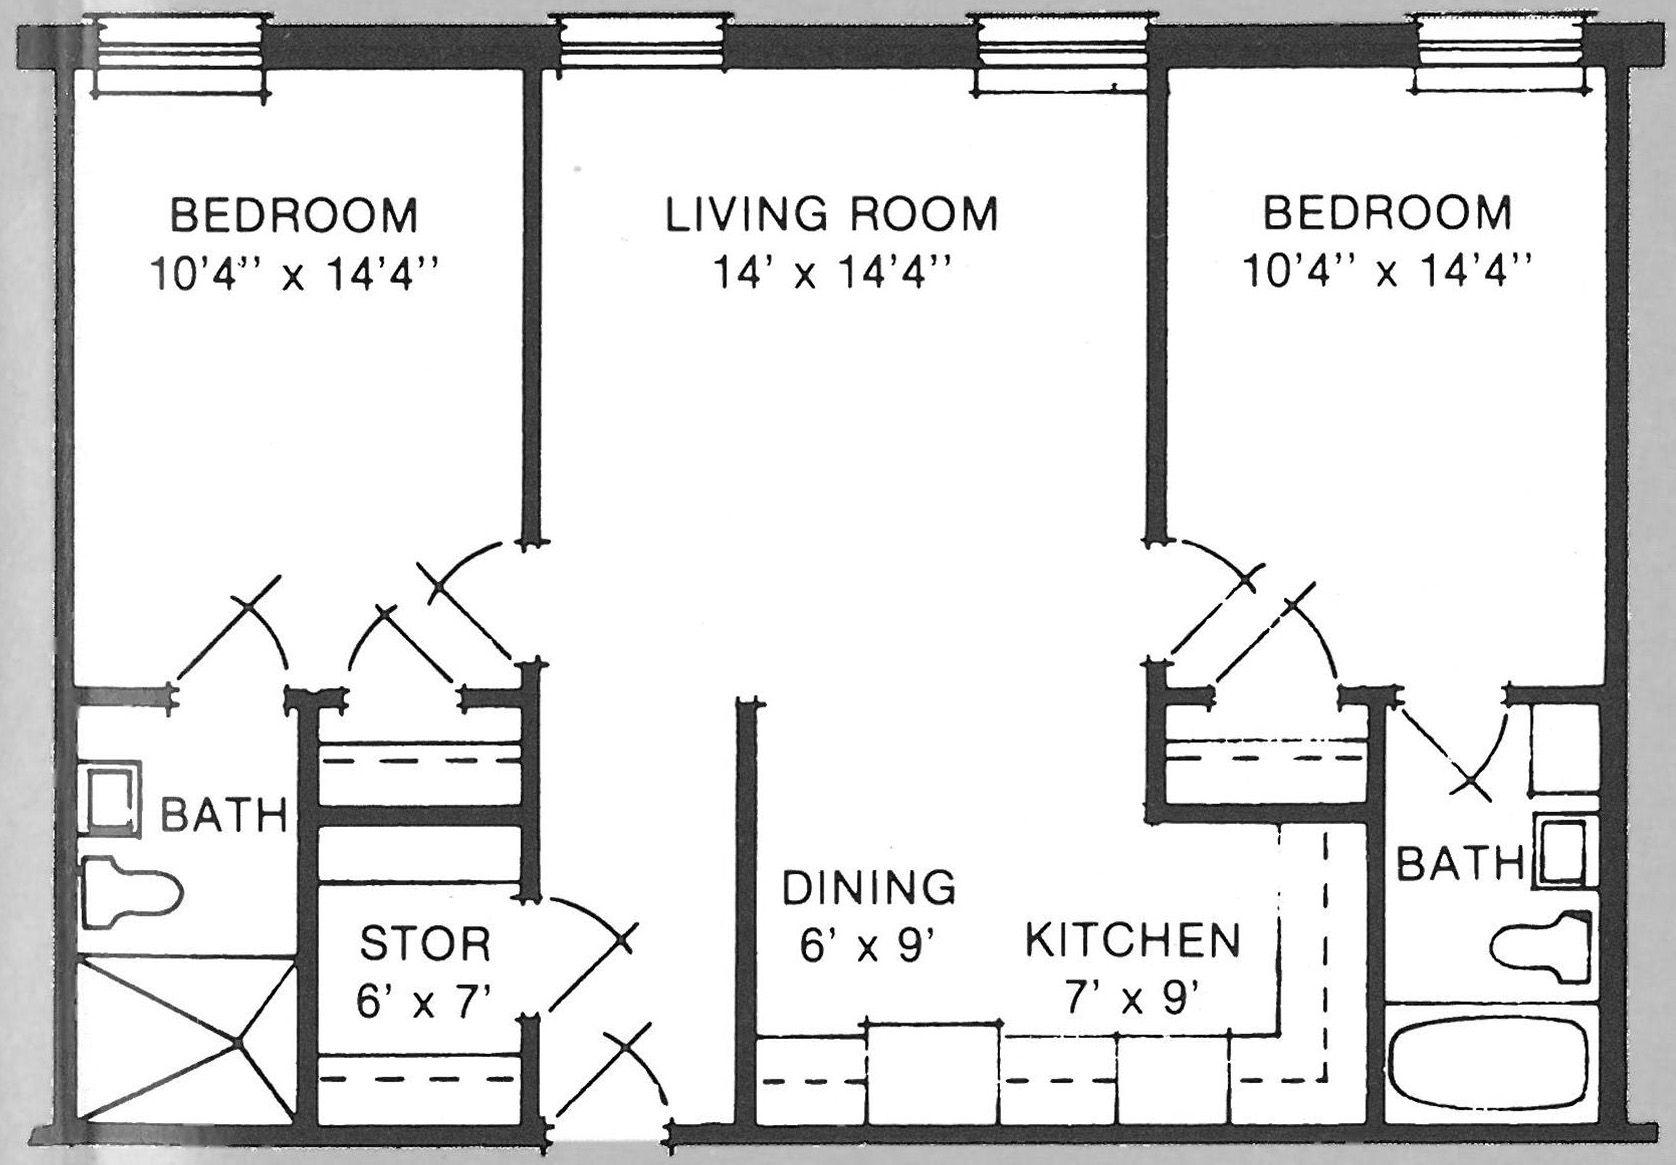 House Minimalist House Plans Under 100k House Plans